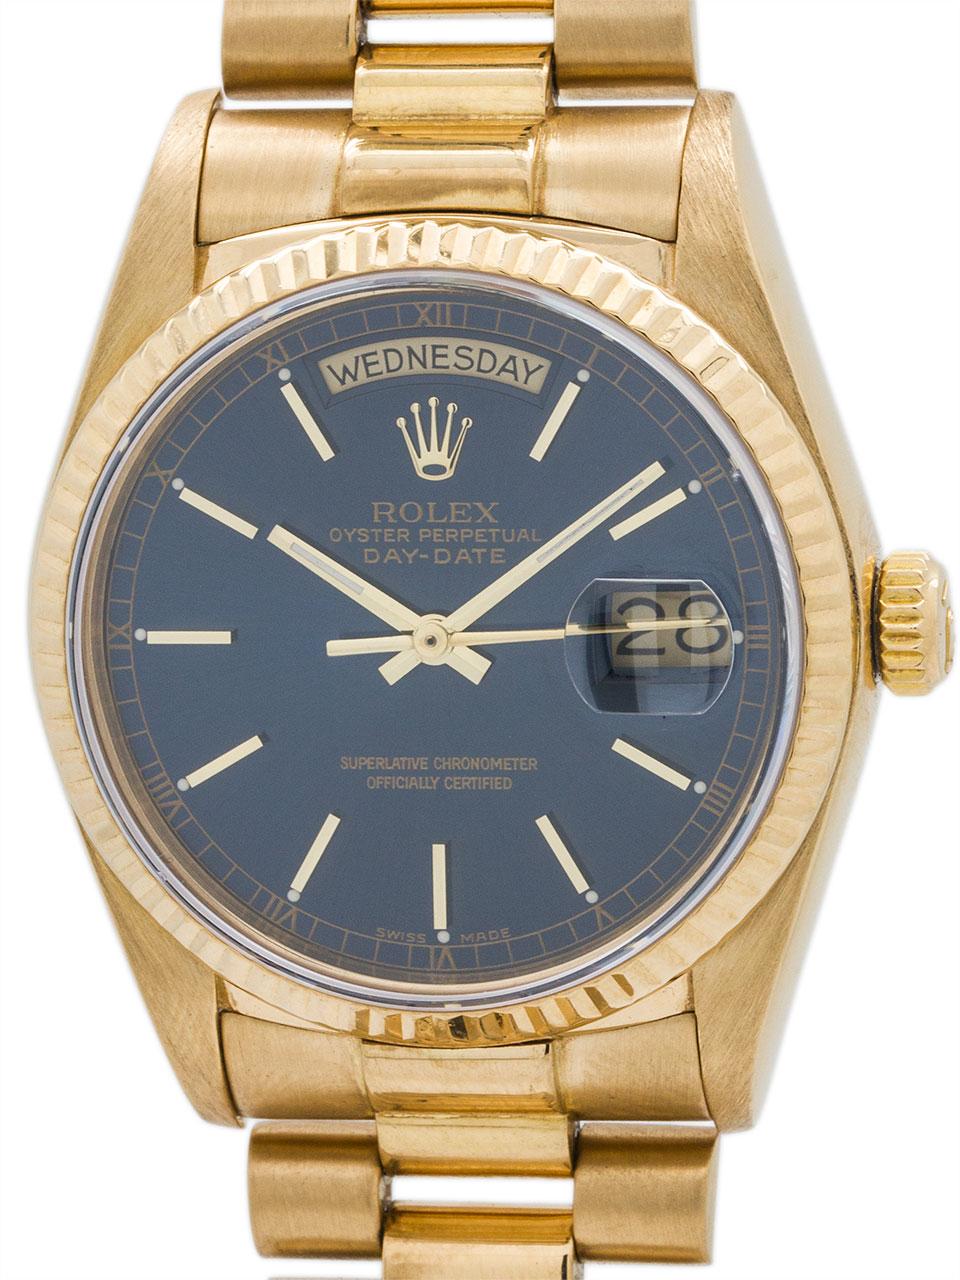 Rolex 18K YG Day Date President ref 18038 circa 1987